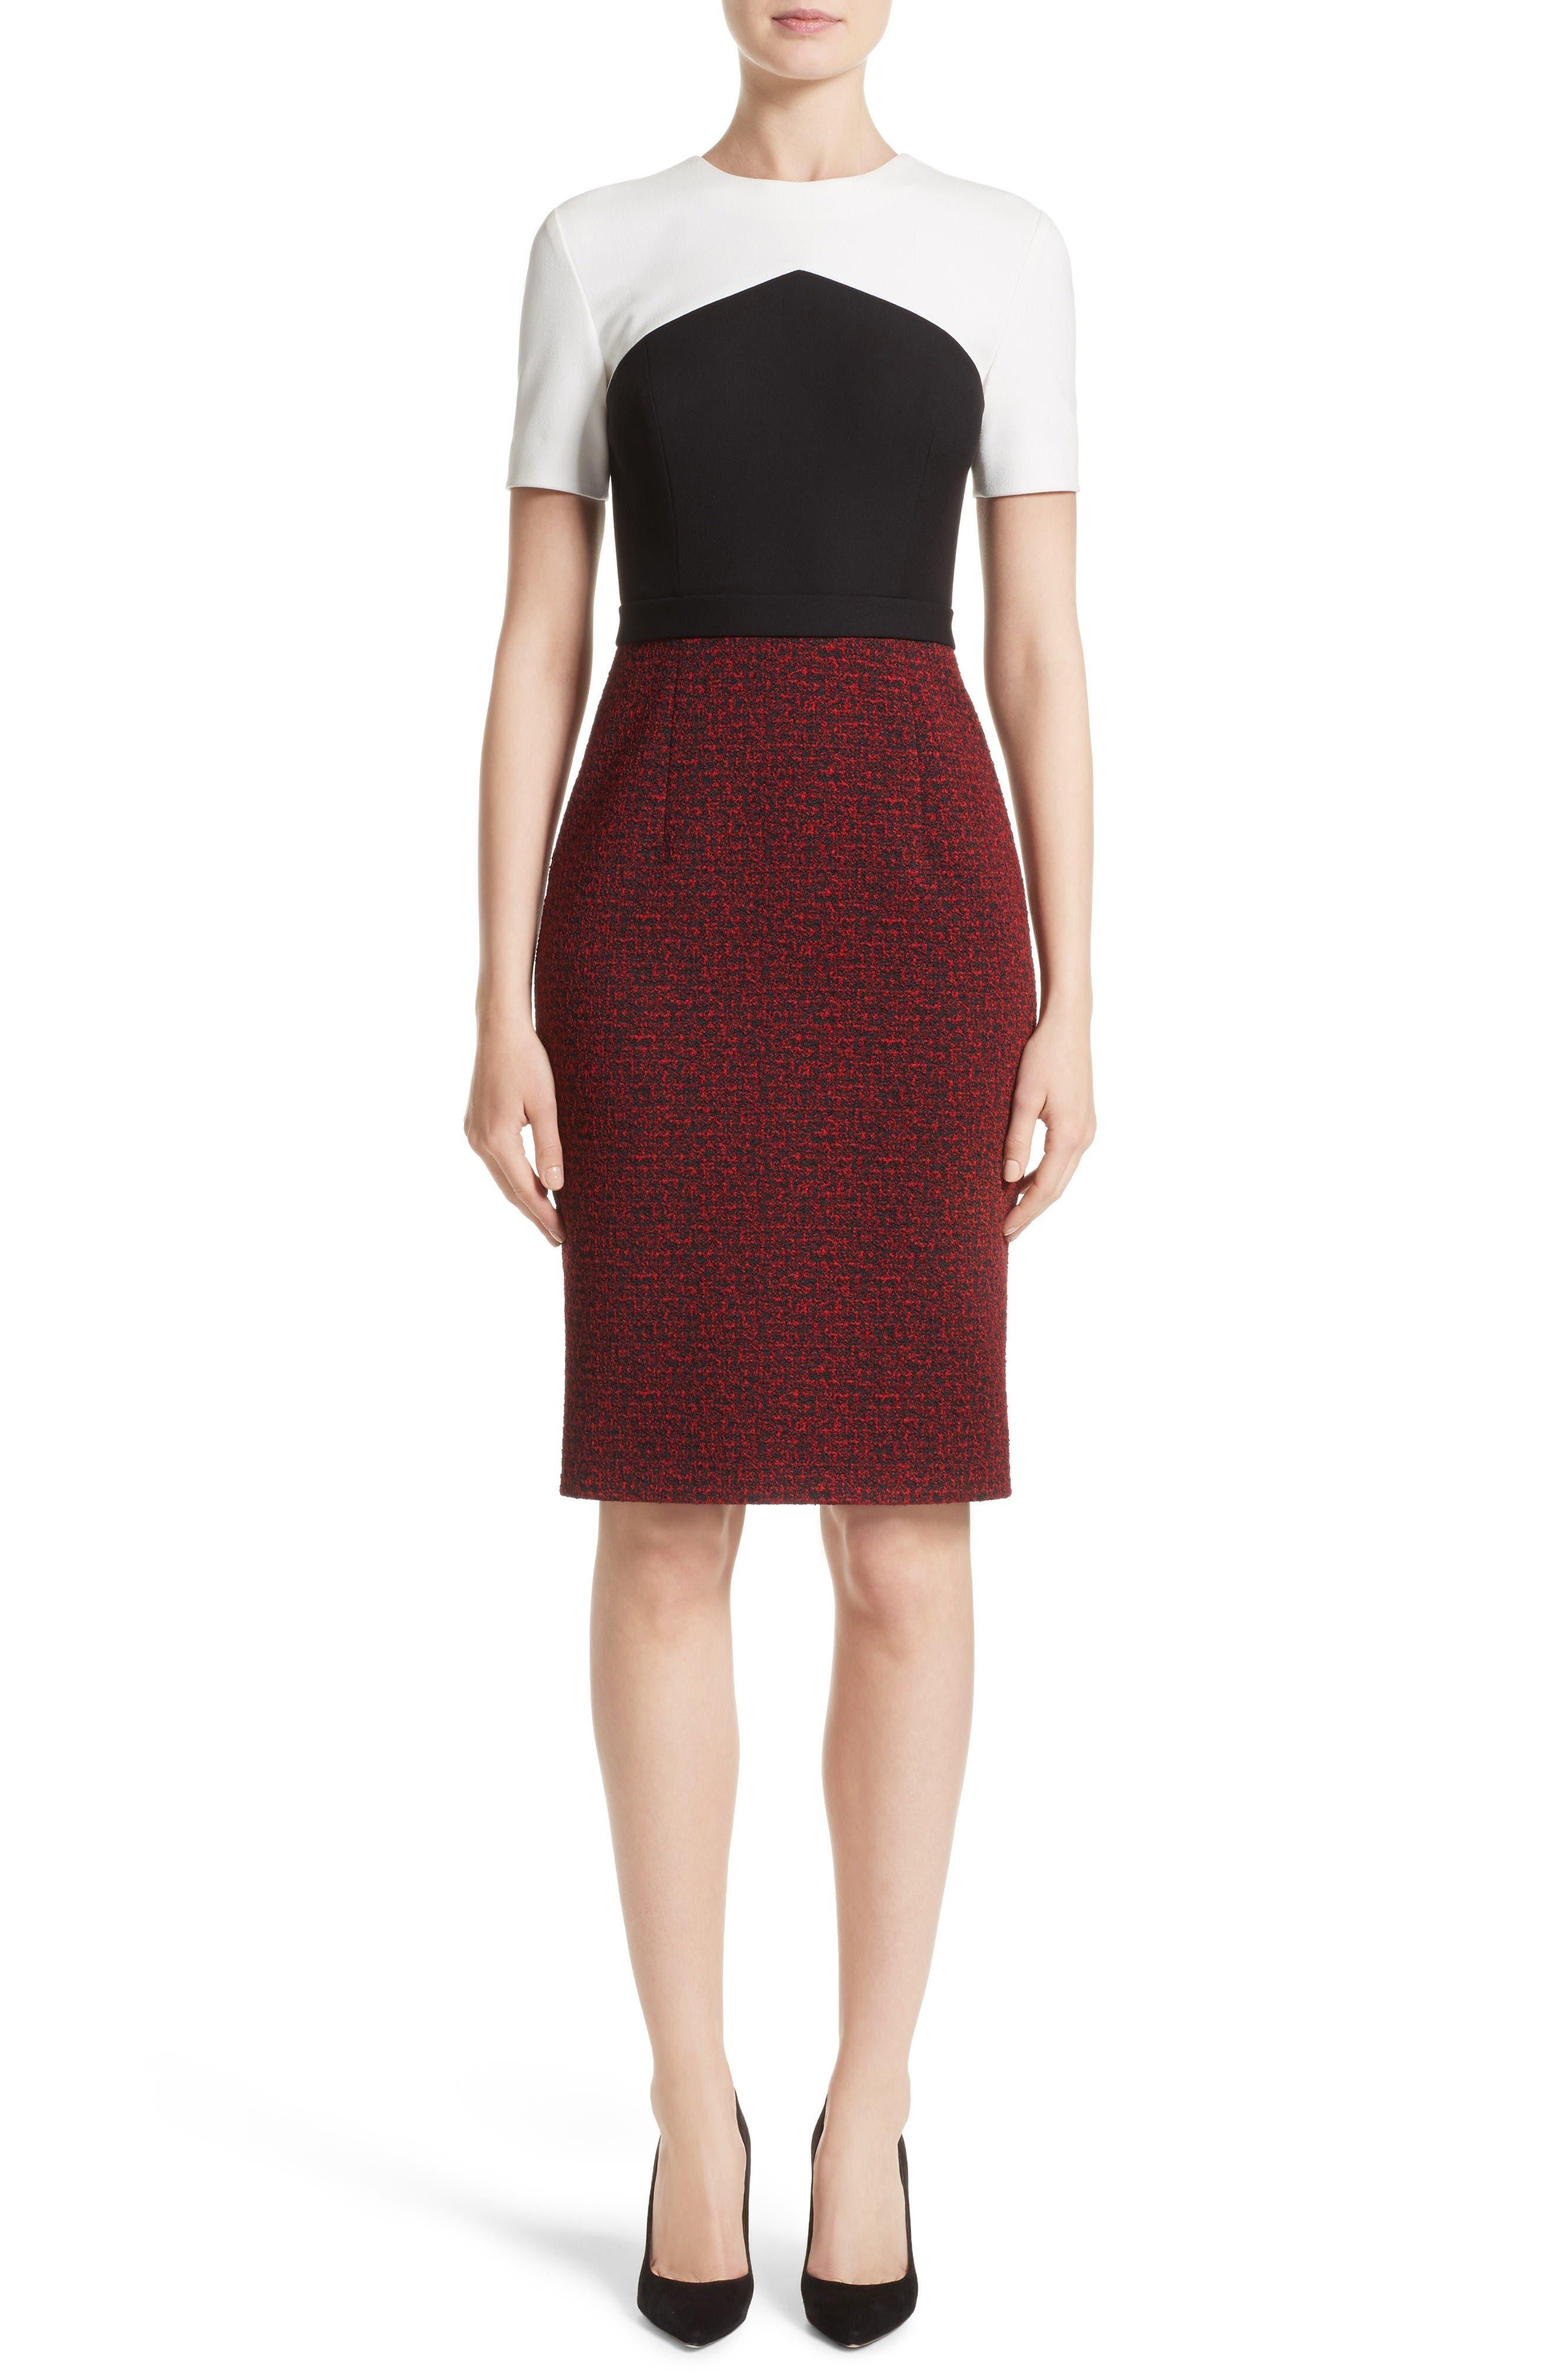 Jason Wu Tweed Knit Jacquard Colorblock Dress